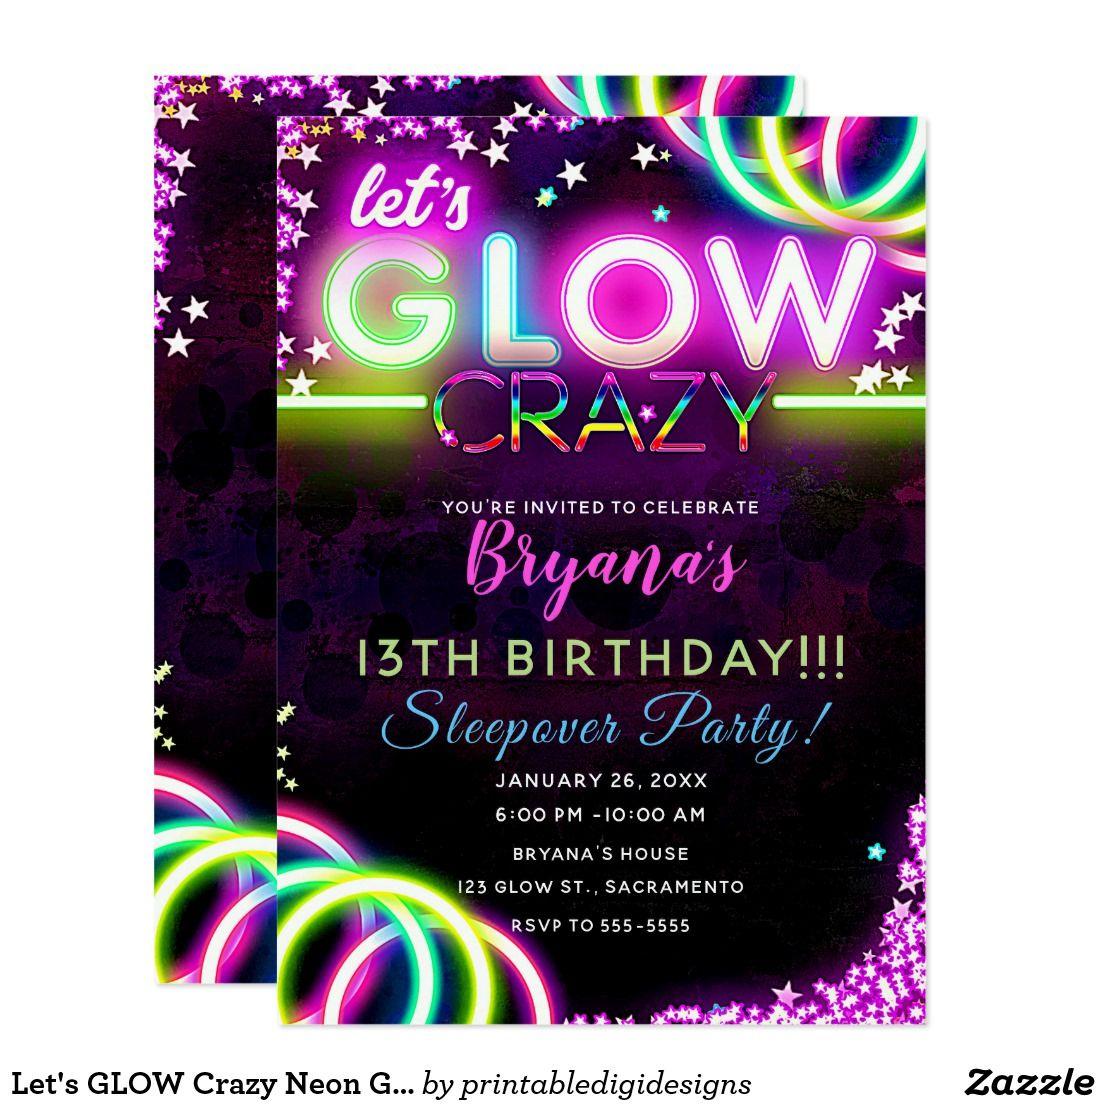 Neon Glowing Birthday Party Invitation